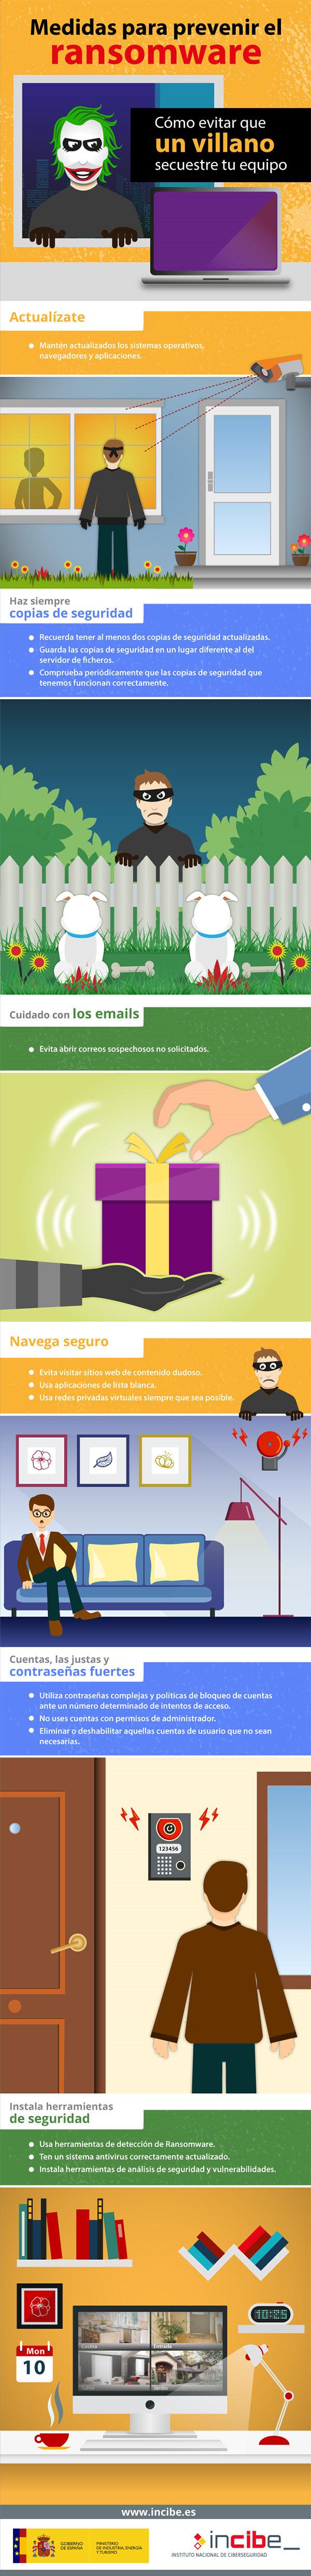 medidas-prevenir-ransomware-incibe